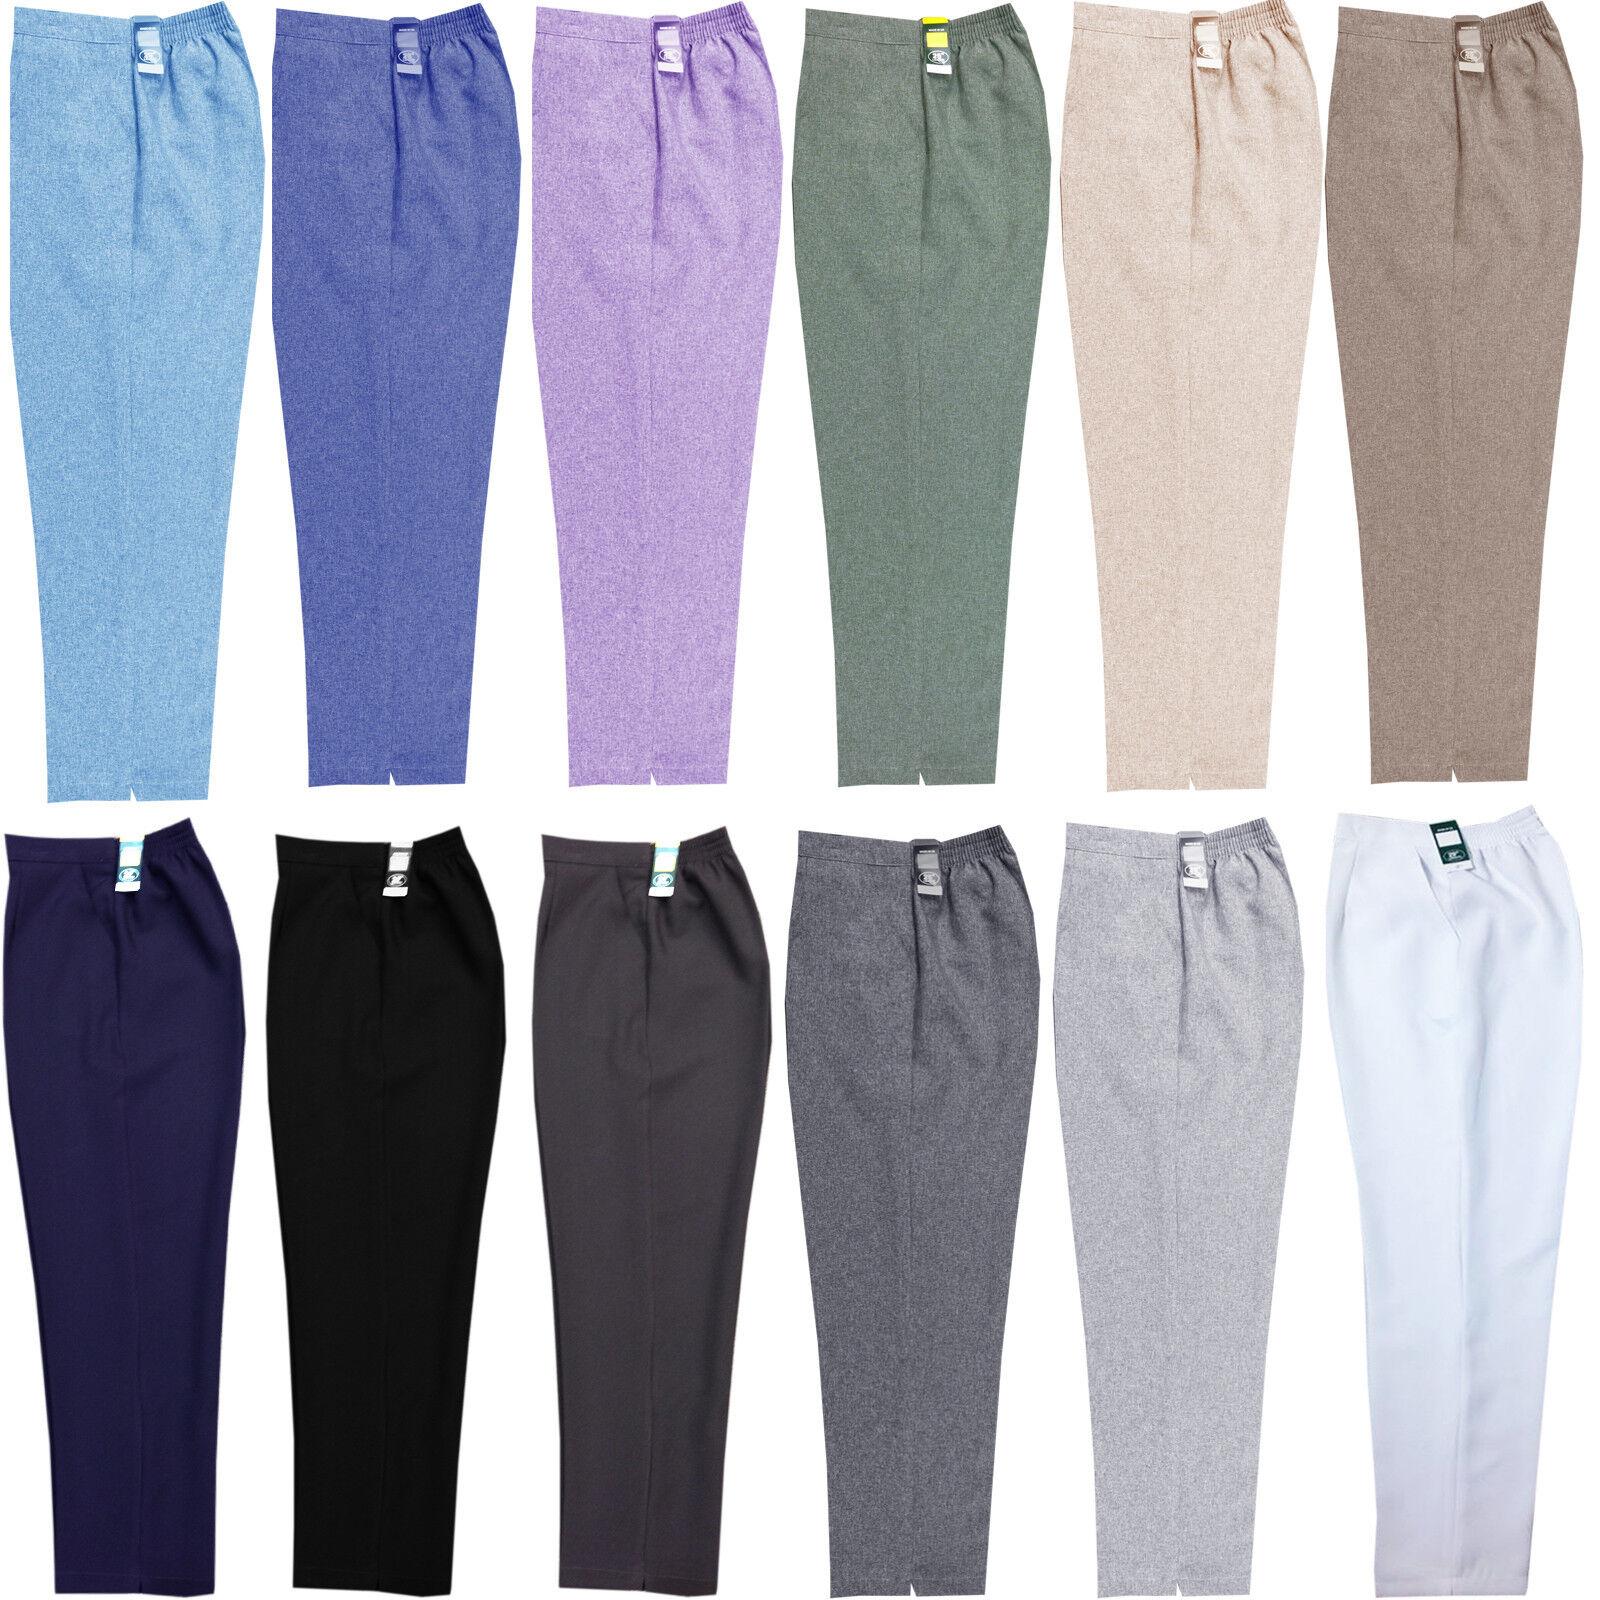 Ladies Womens Work Trousers Half Elasticated Stretch Waist Pull Up Work Pants